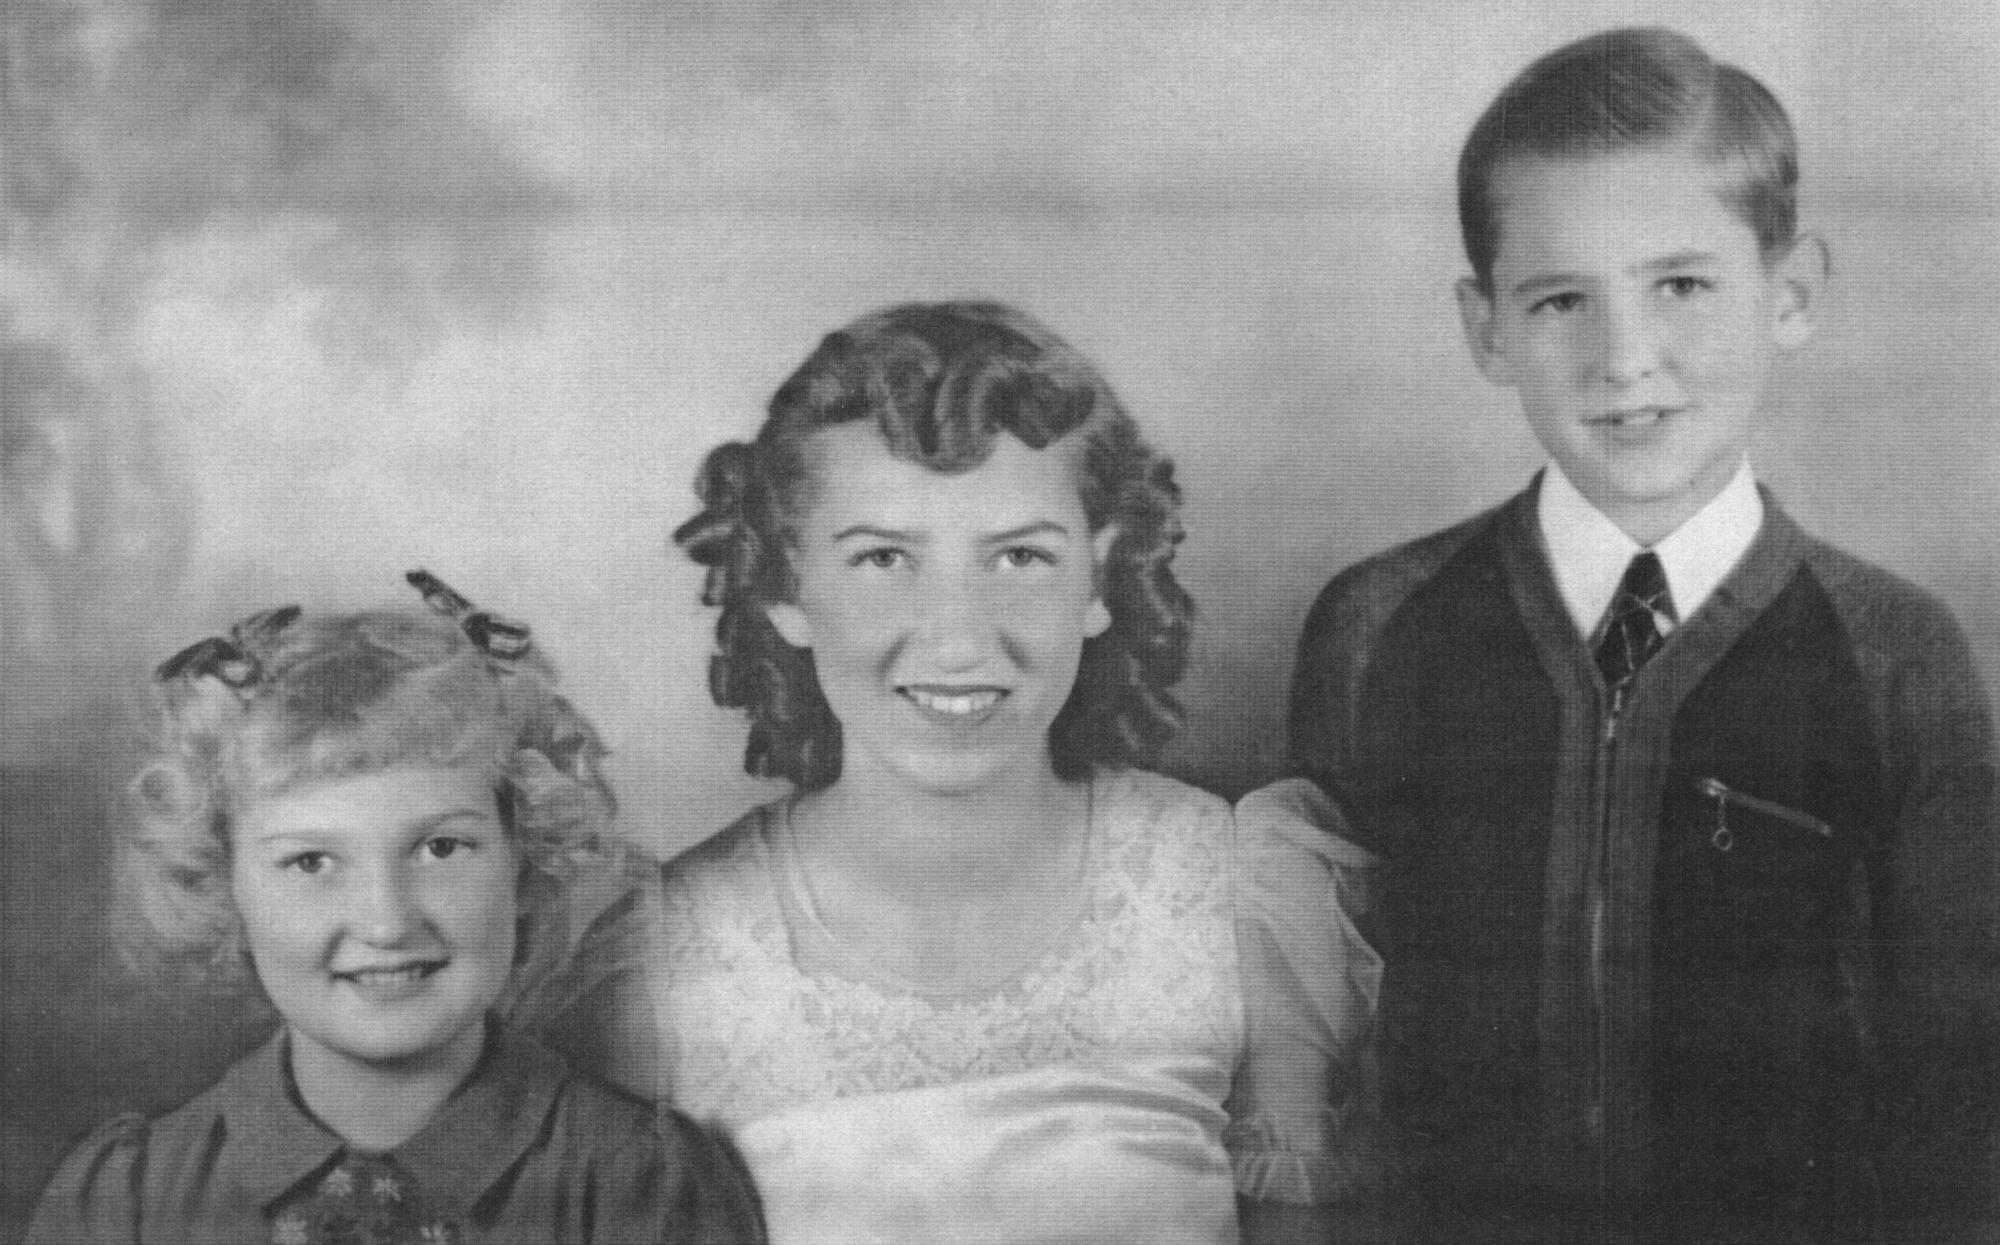 Edith's children: Glenna, Dolores, and Robert